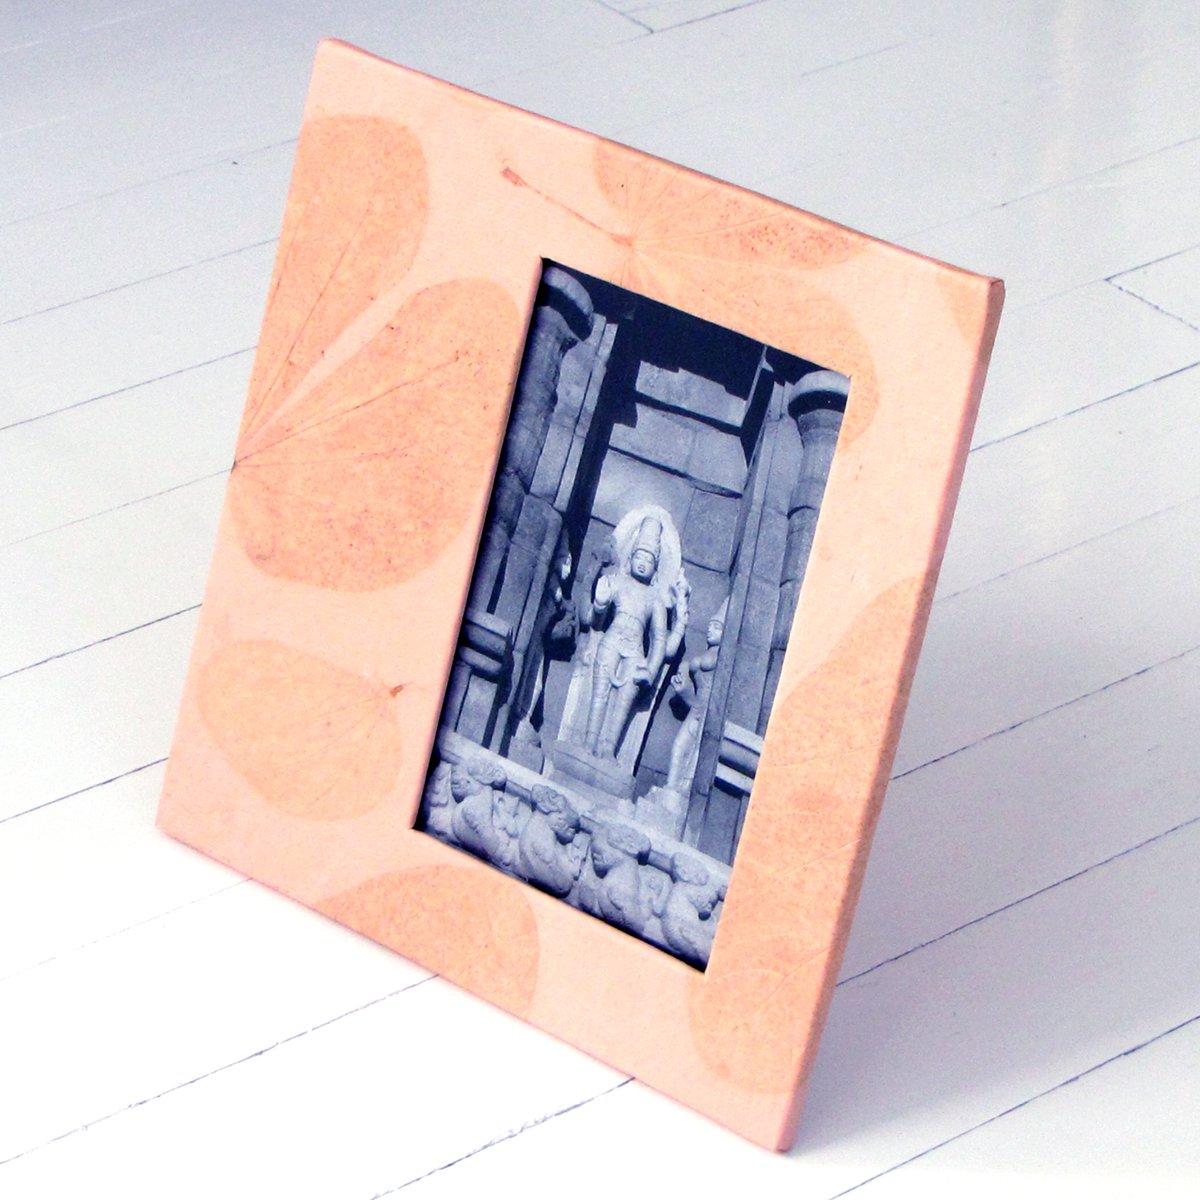 Photo frame anniversary gift handmade pink heart leaf imprint paper 4x6/5x7